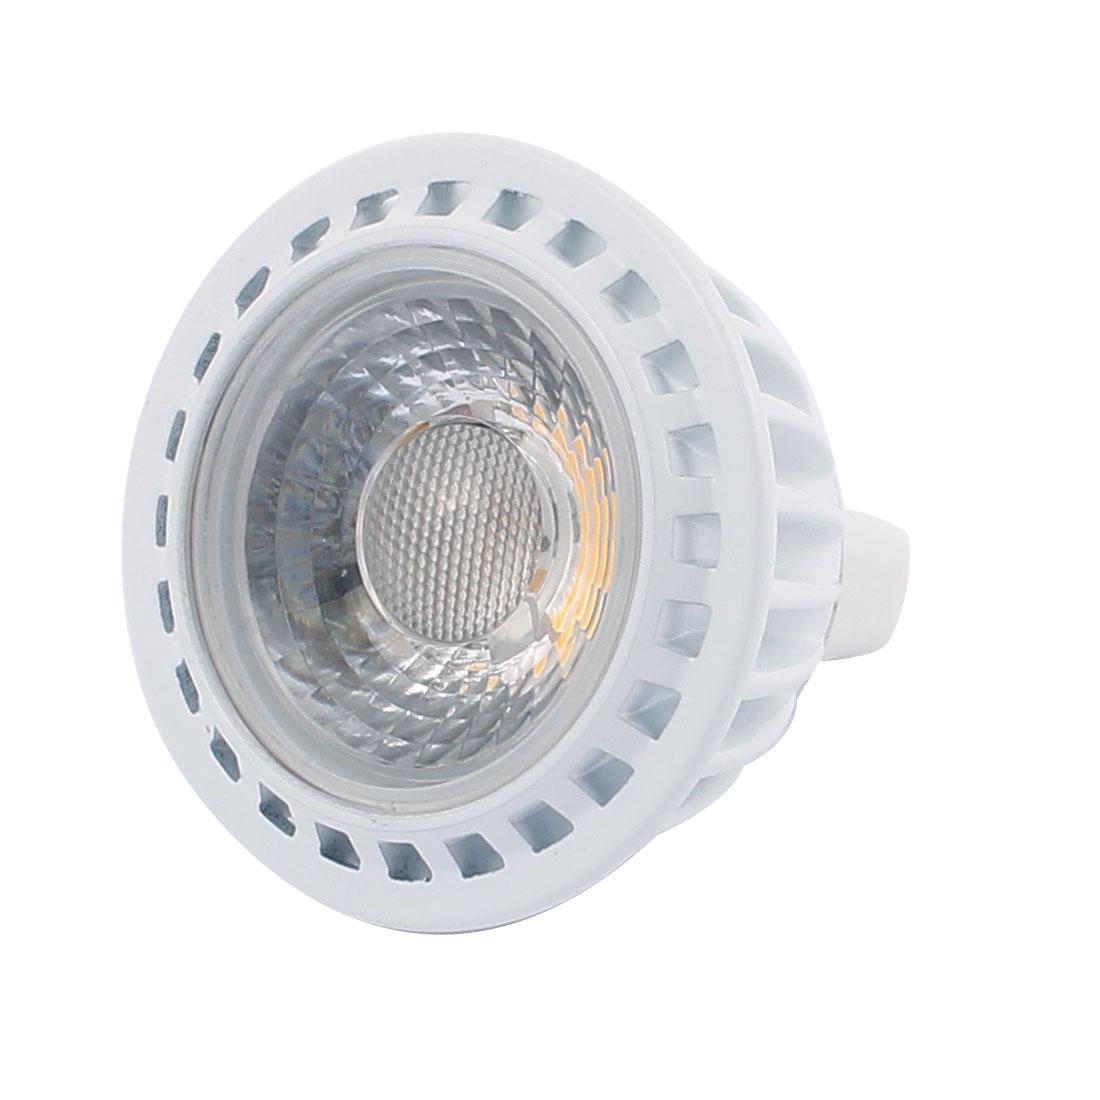 DC12V 3W MR16 COB Integrated Chip LED Spotlight Lamp Bulb Downlight Warm White